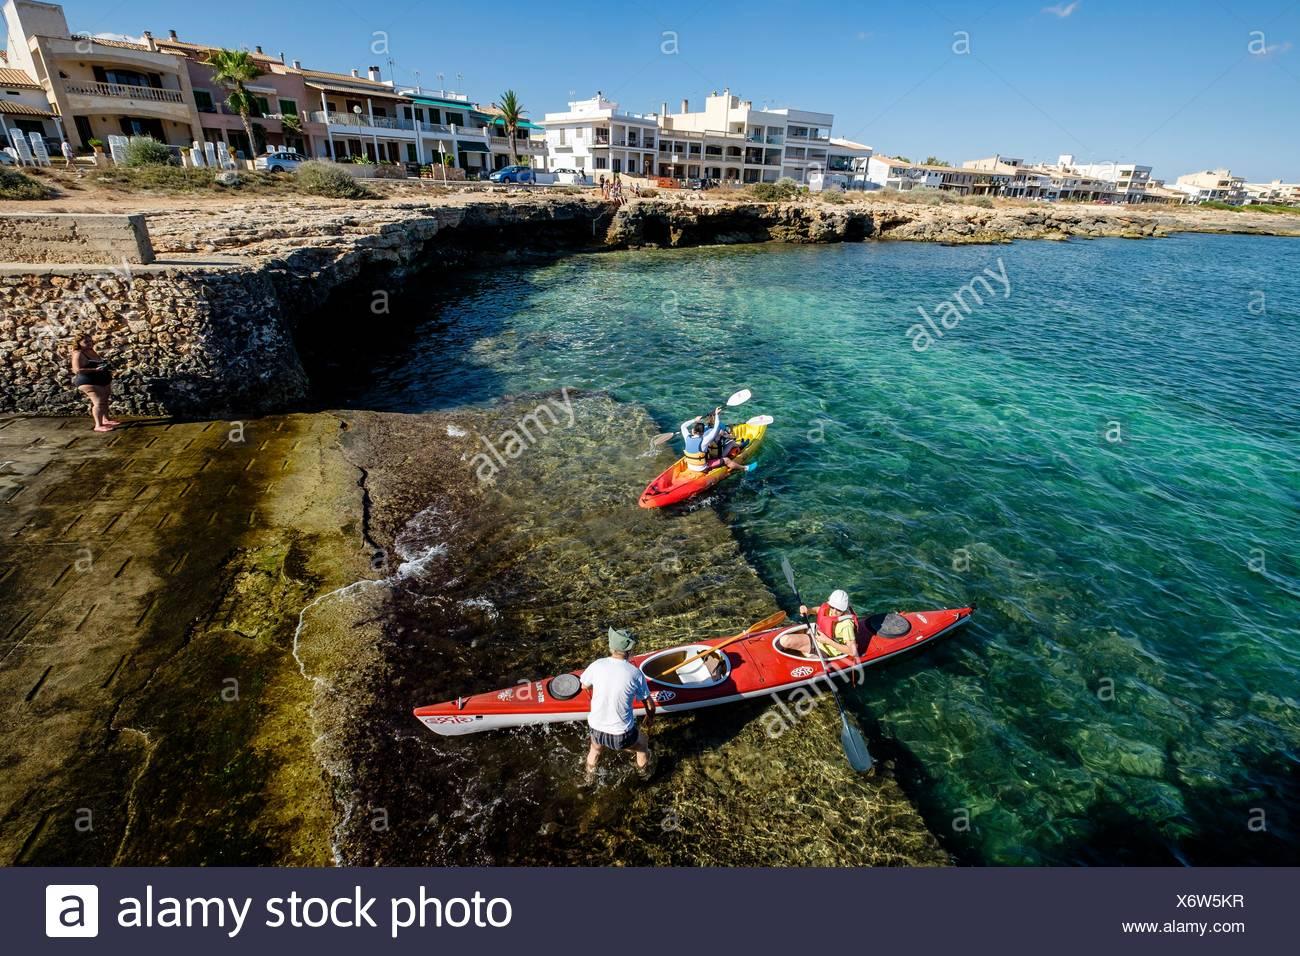 annual output of pirogues,festivities, Sa Rapita, Campos, Majorca, Balearic Islands, Spain - Stock Image